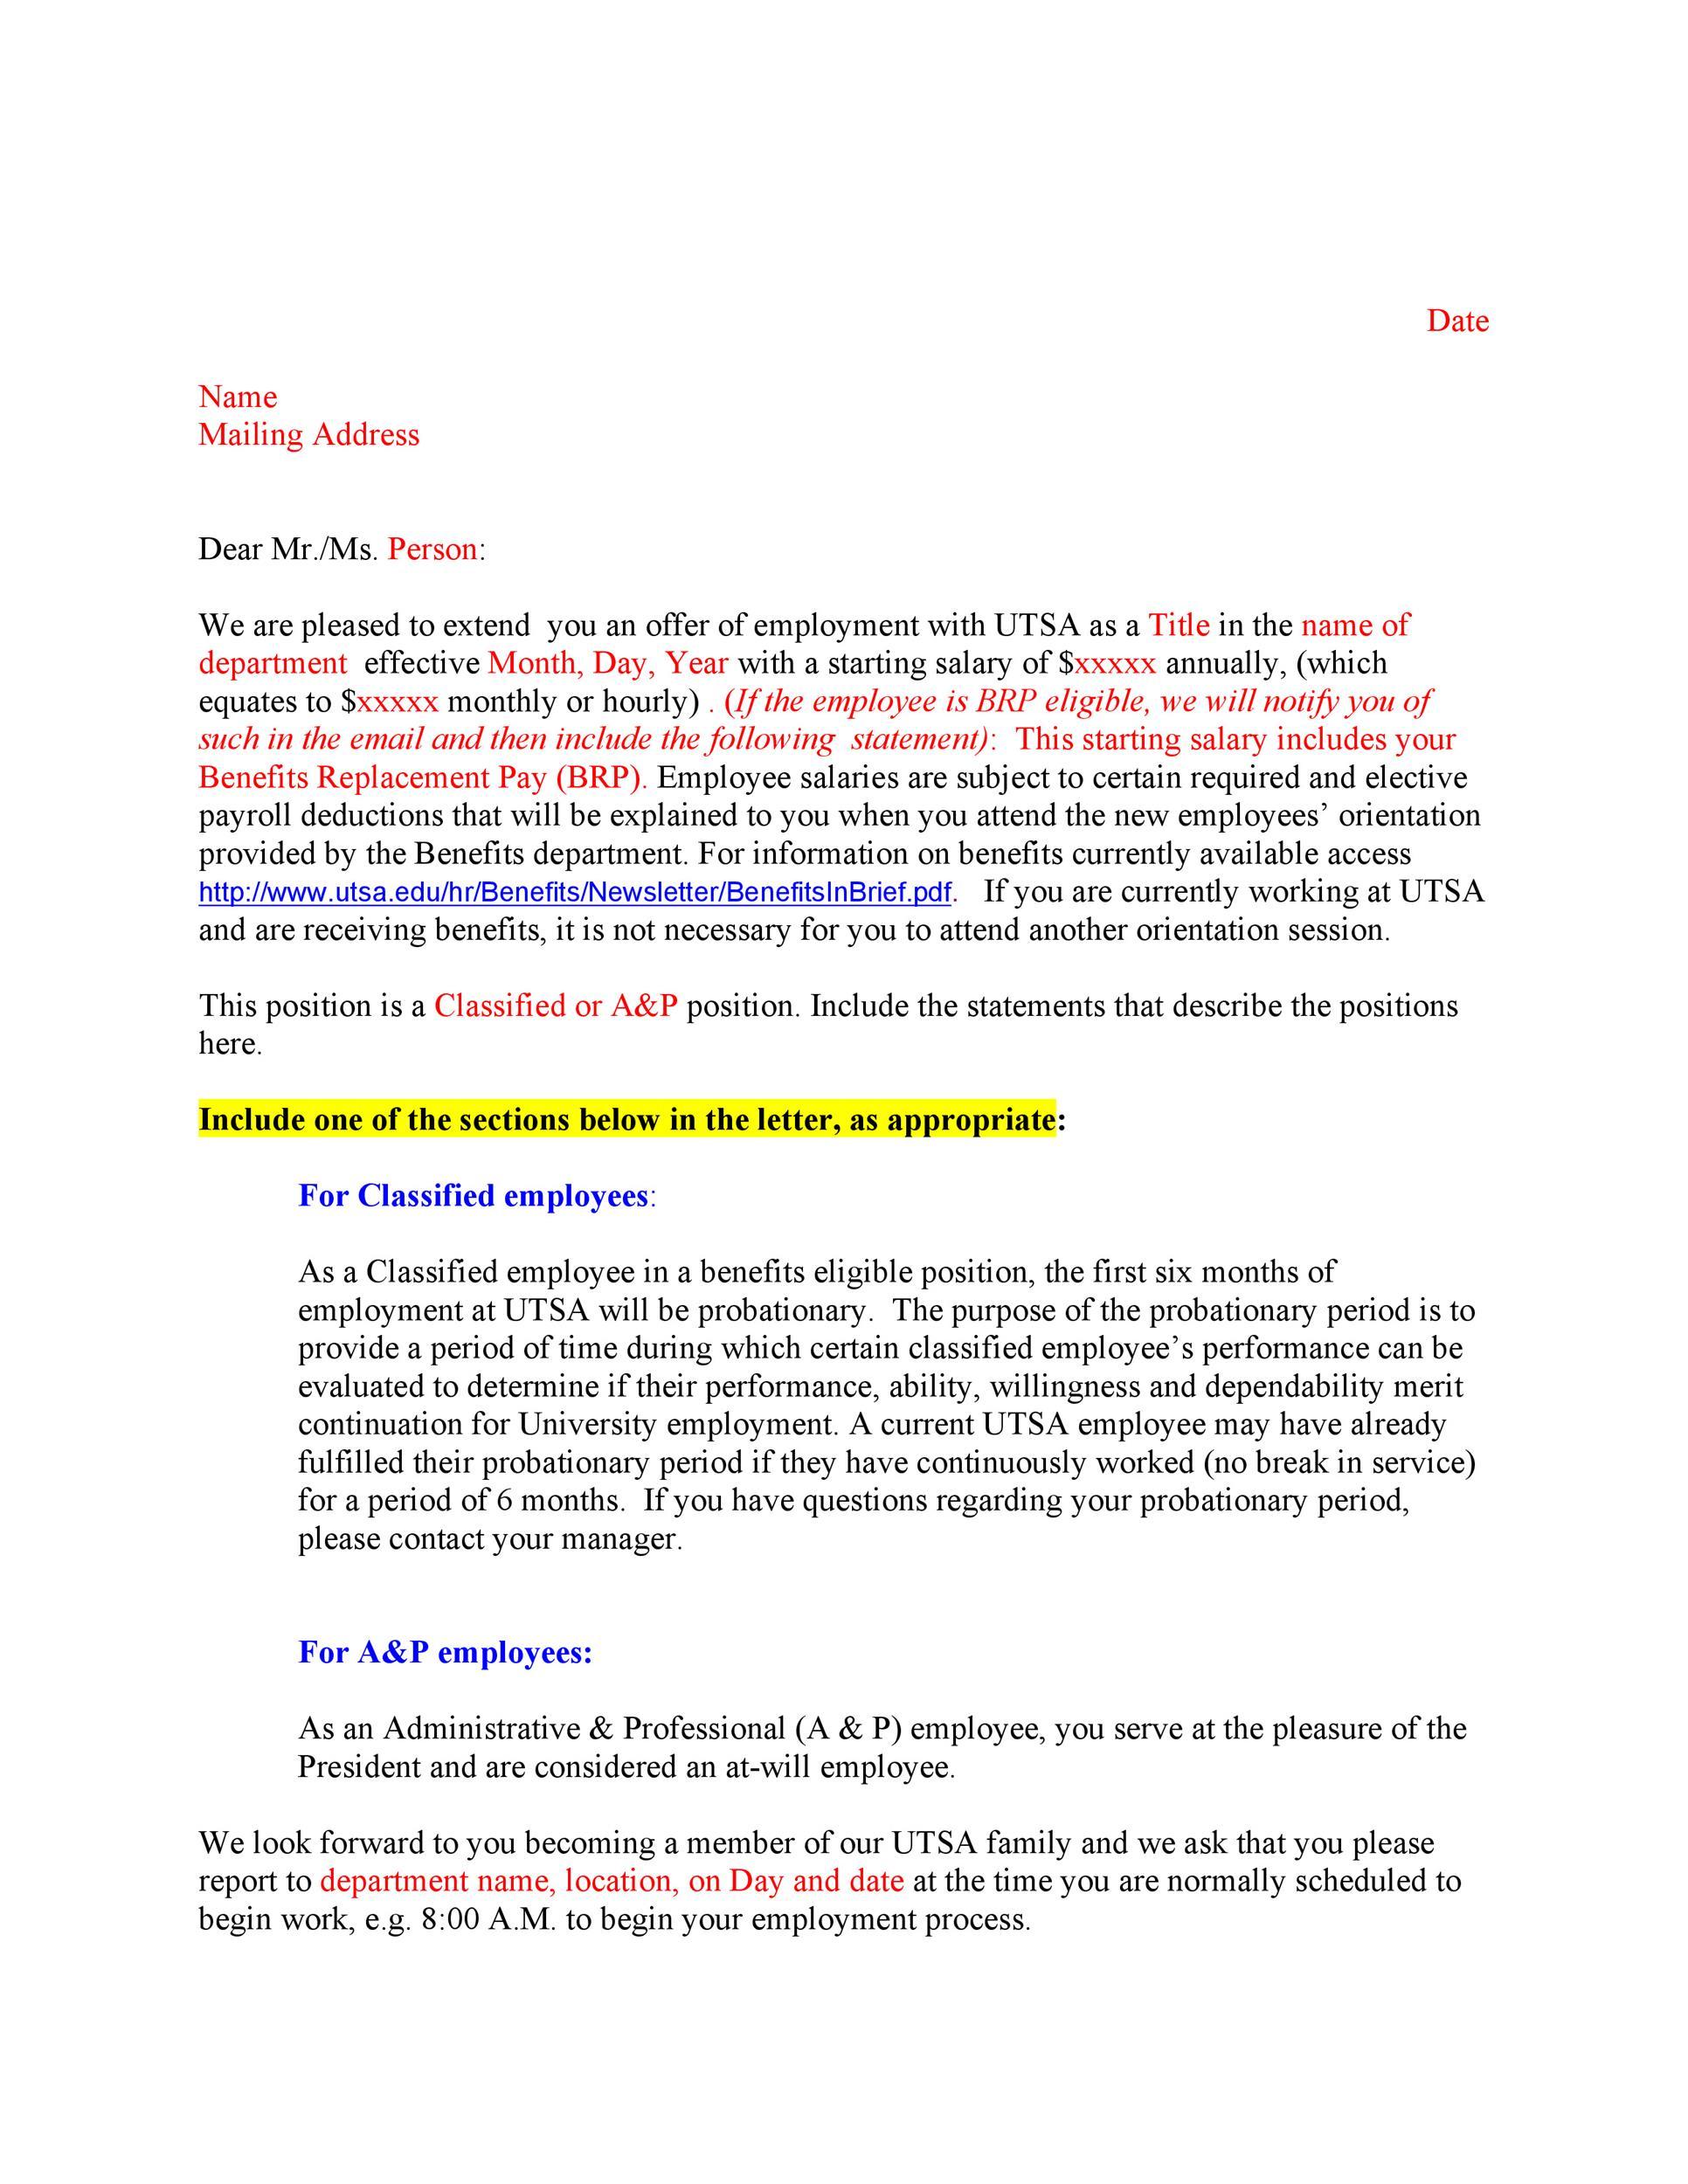 Free Offer letter 02